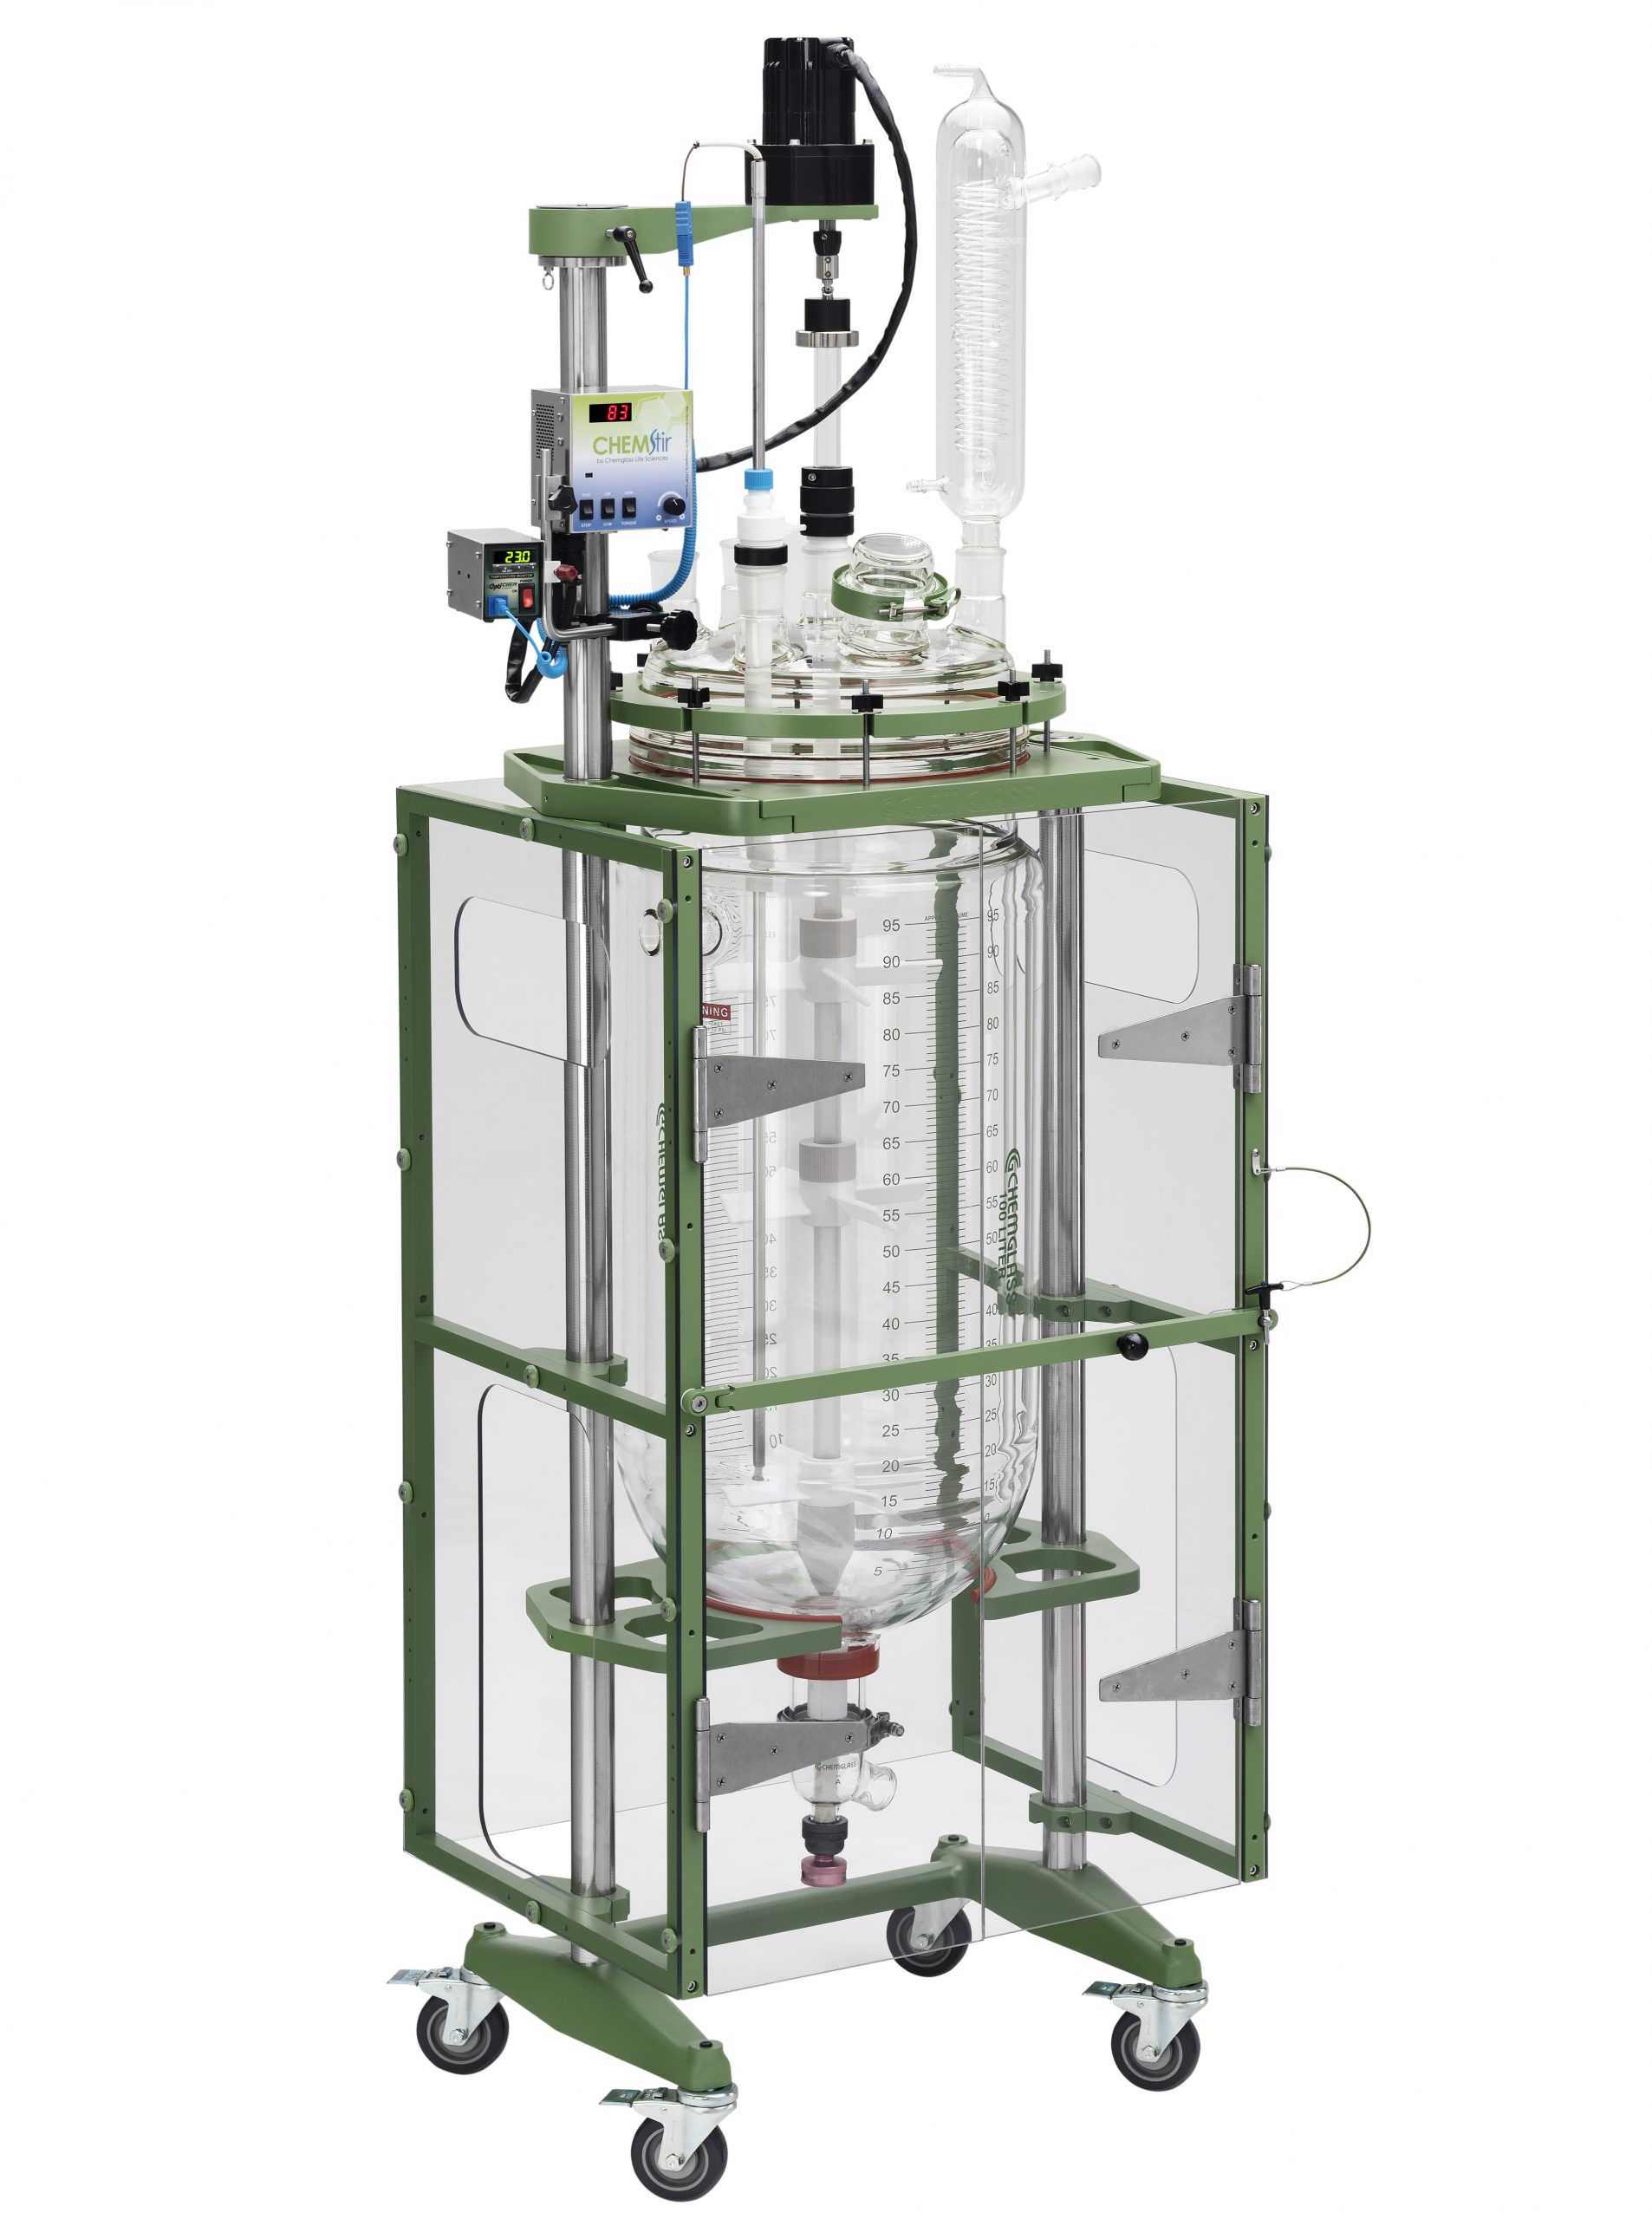 Reactor Image